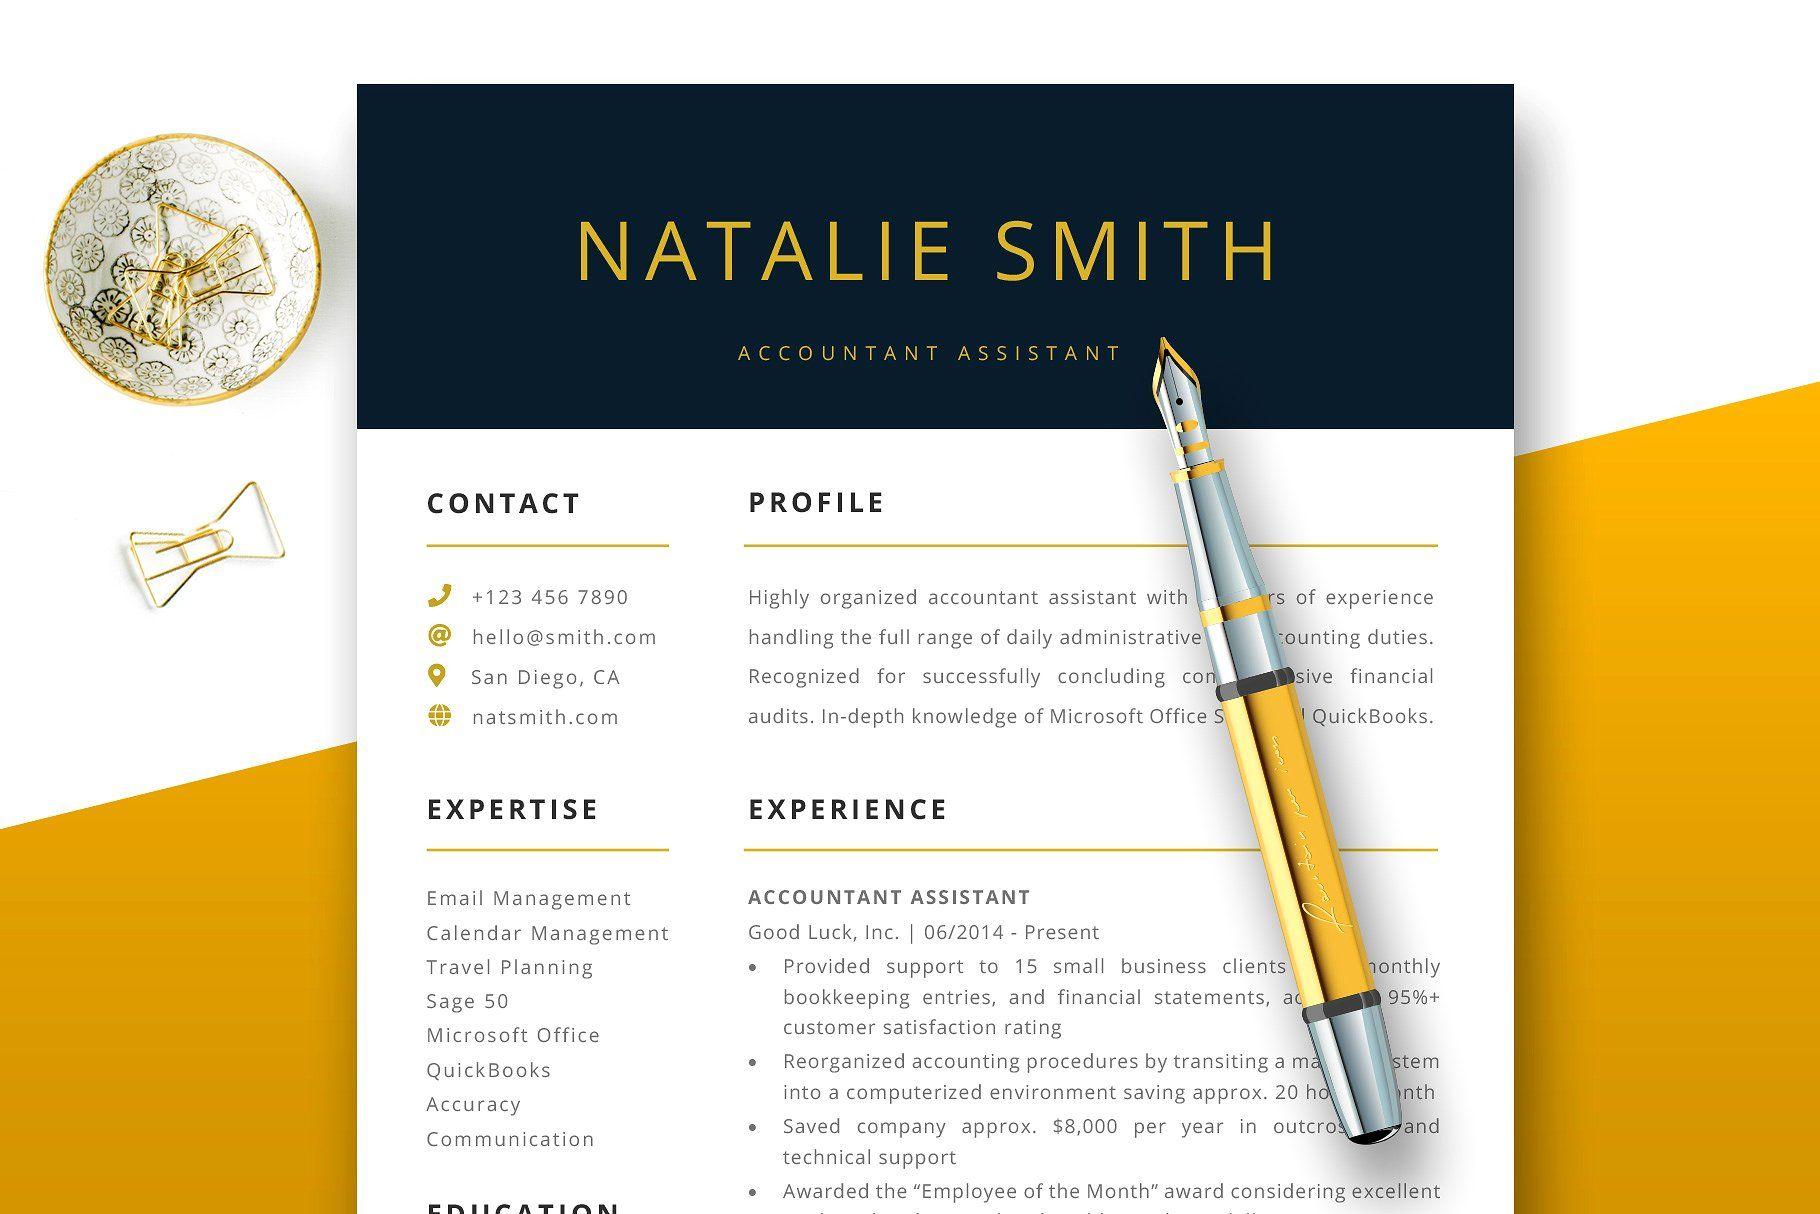 Accountant assistant resume cv pointstrickstips